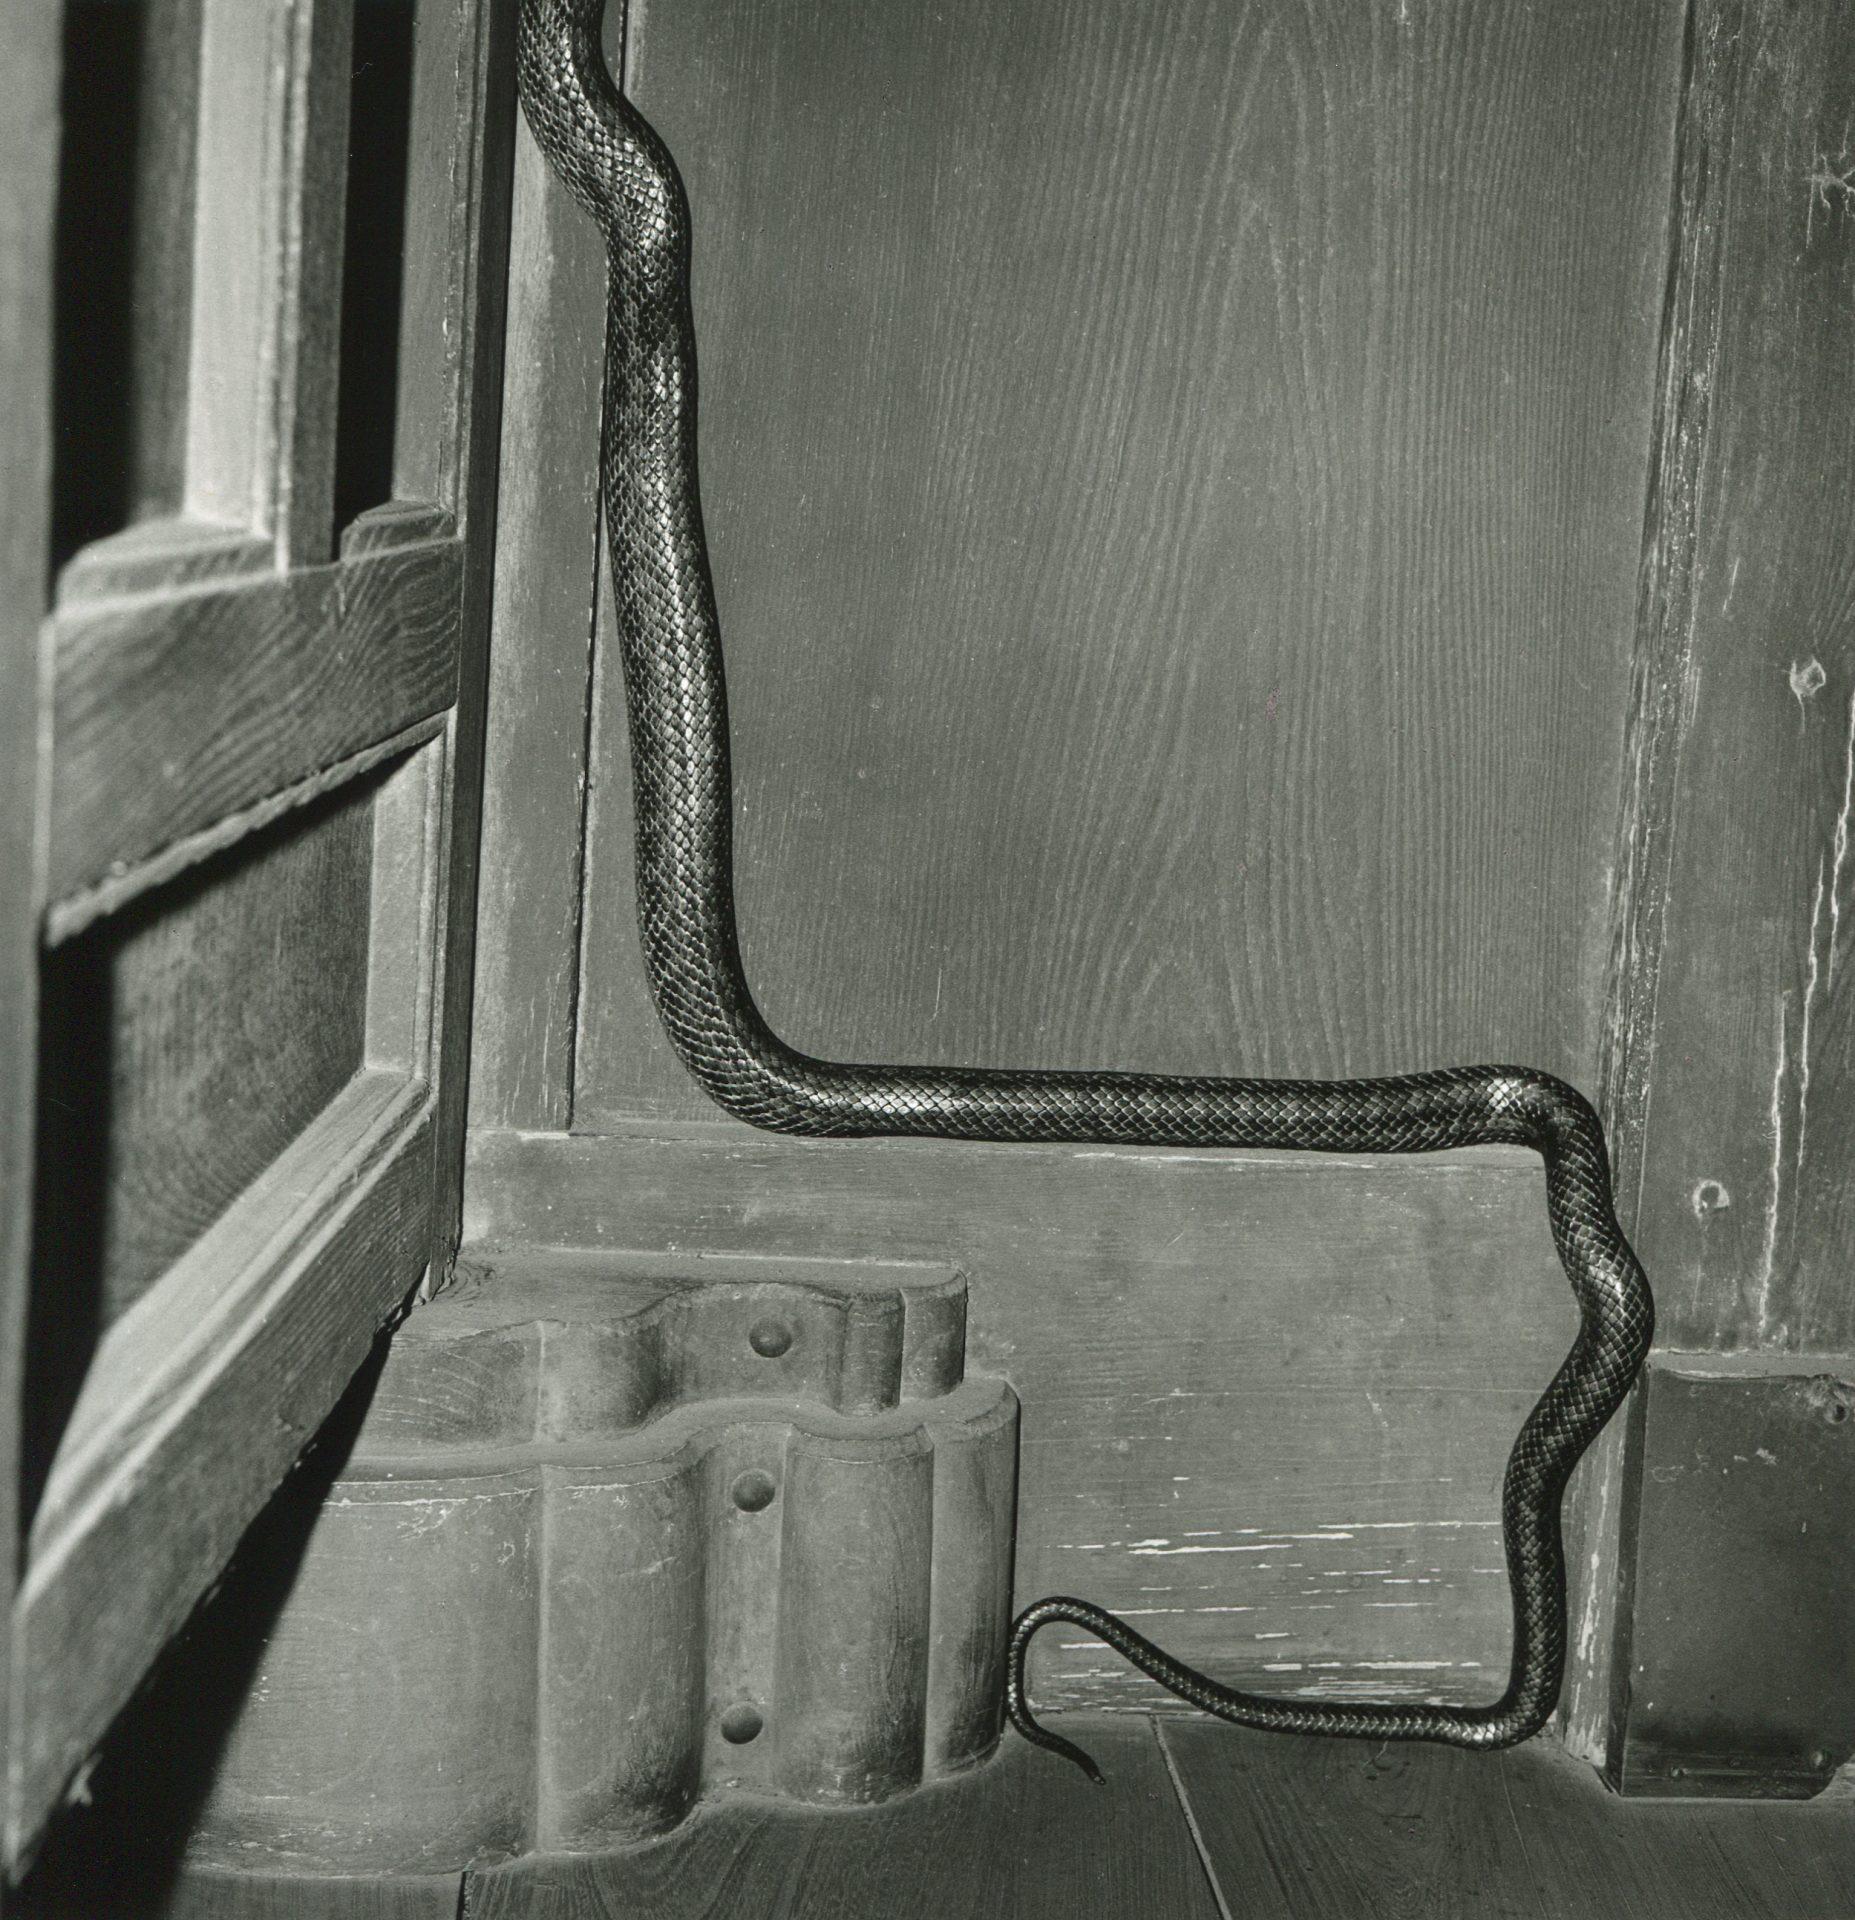 亞紀選 須田一政 Suda Issei 風姿花傳 Fushikaden 1975 銀鹽照片 gelatin silver print paper size 31x25 cm image size 35x35 cm vintage